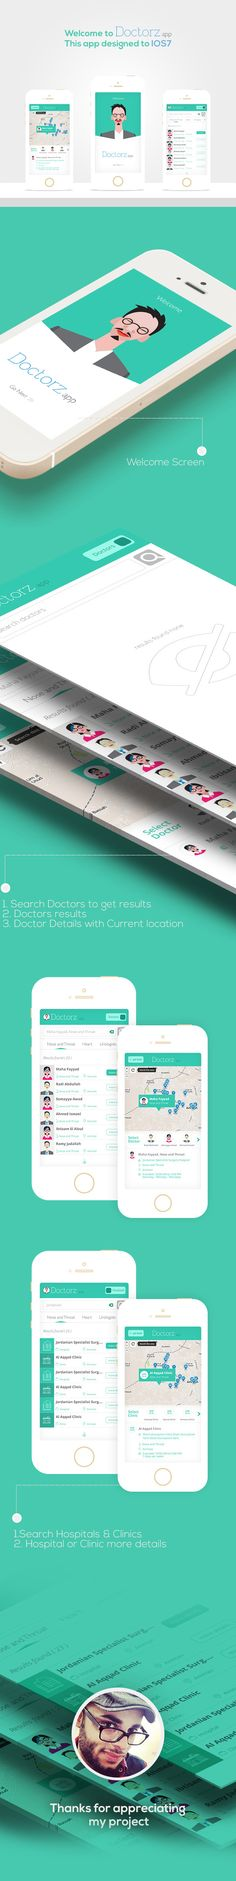 Doctorz Mobile app